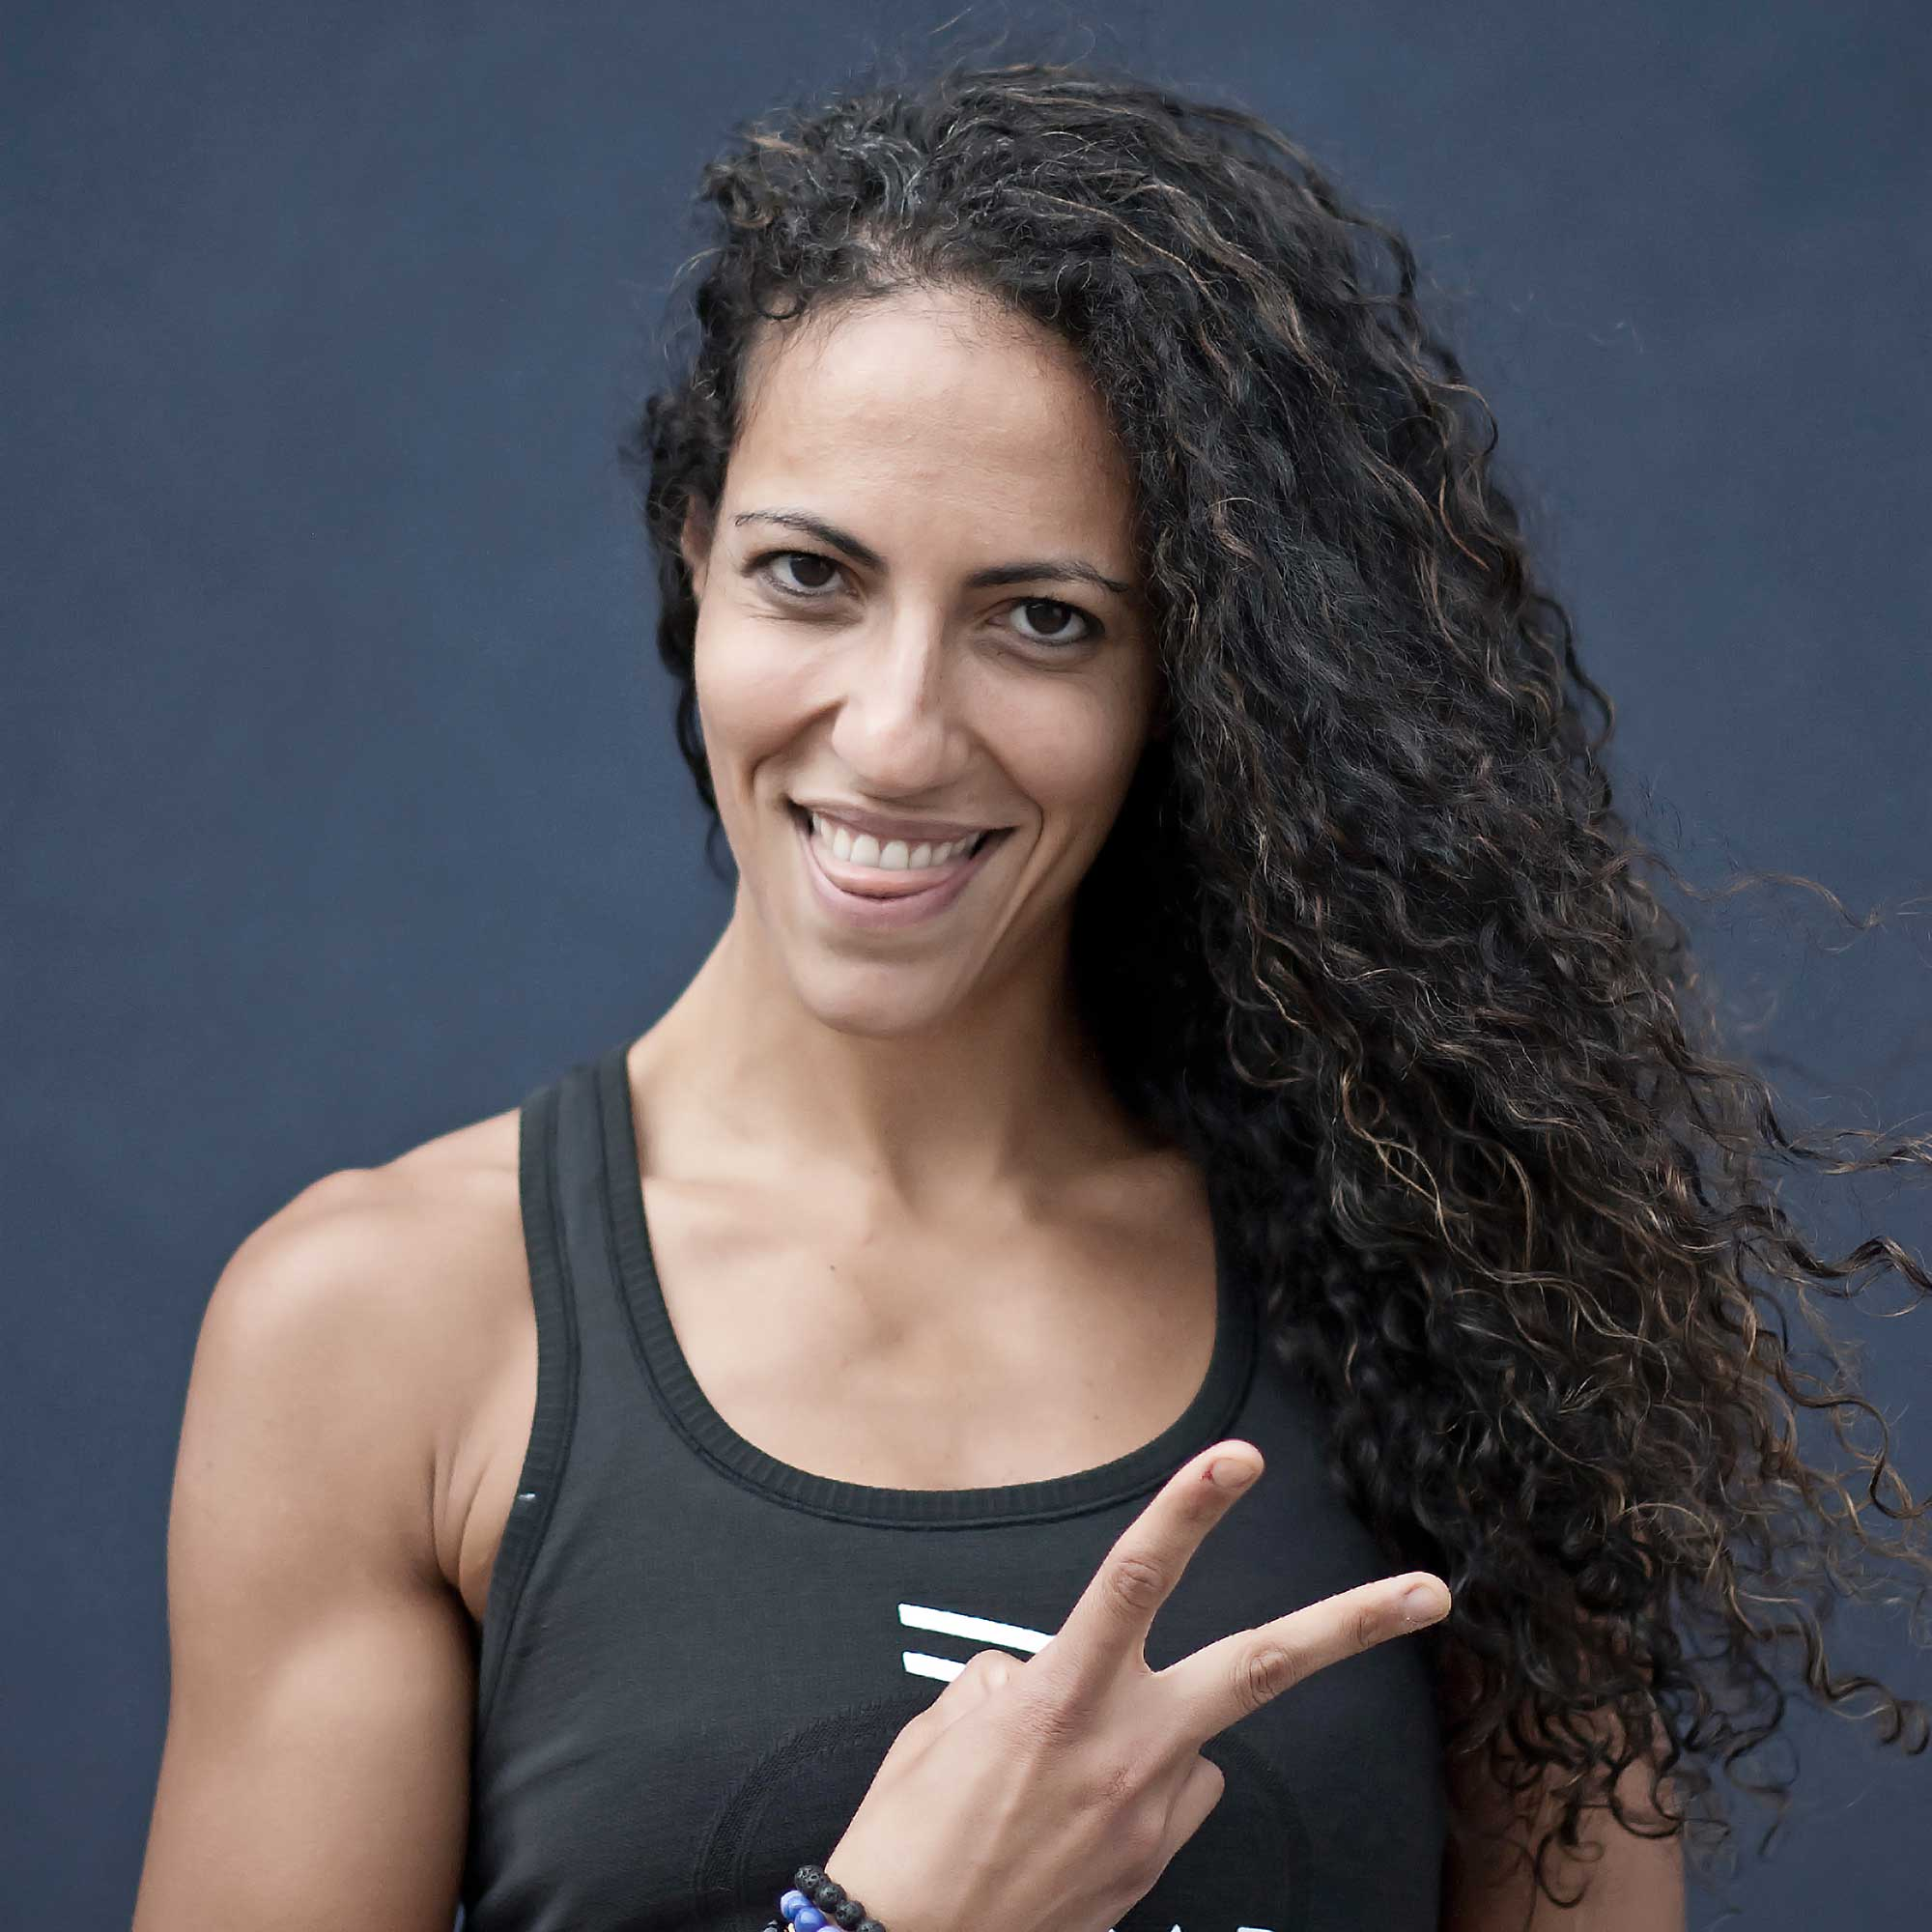 Photo of UNDRCARD Boxing Instructor, Shaima, by Jess Bobyn